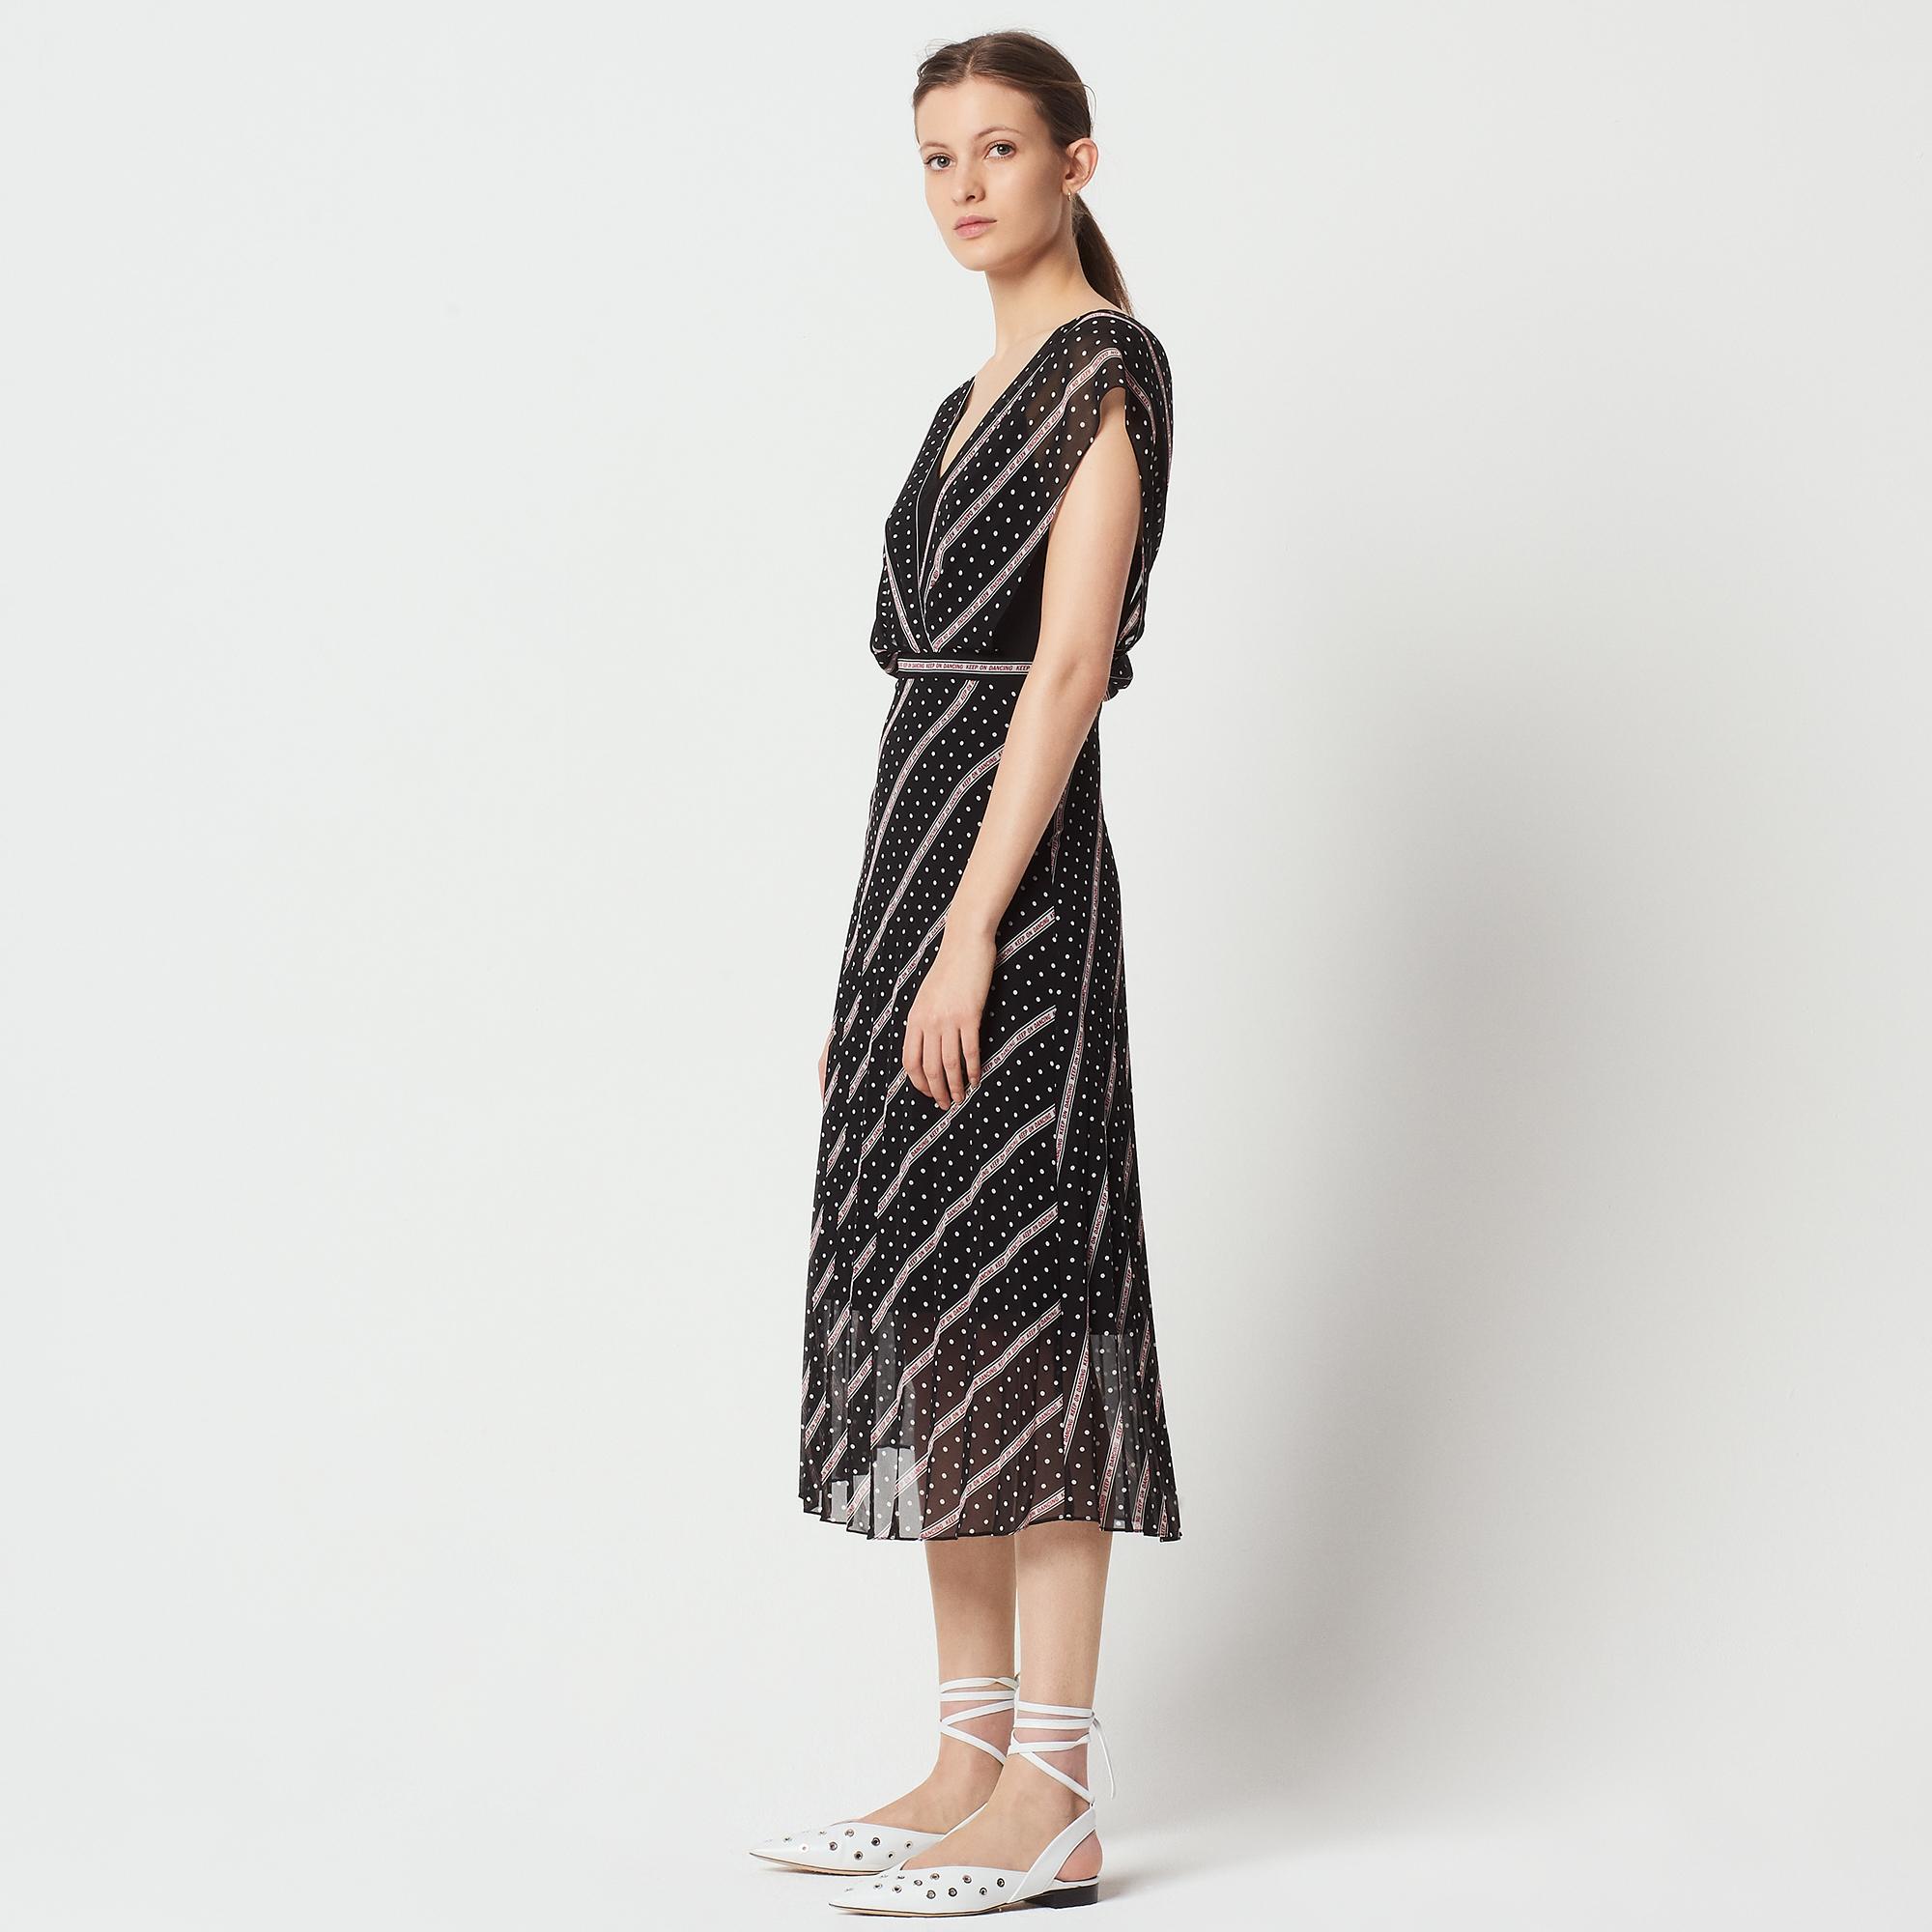 ac6590f987b ... Keep on Dancing long printed dress   Dresses color Black ...